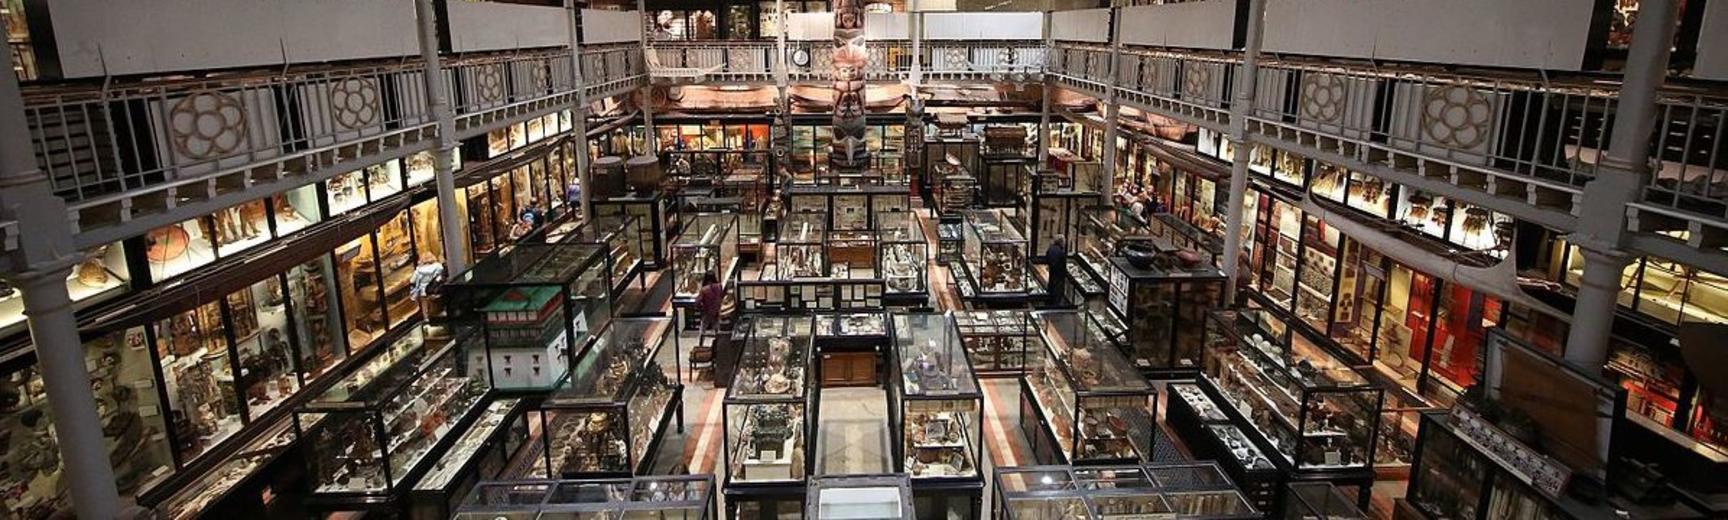 interior of pitt rivers museum 2015 flipped and no tde